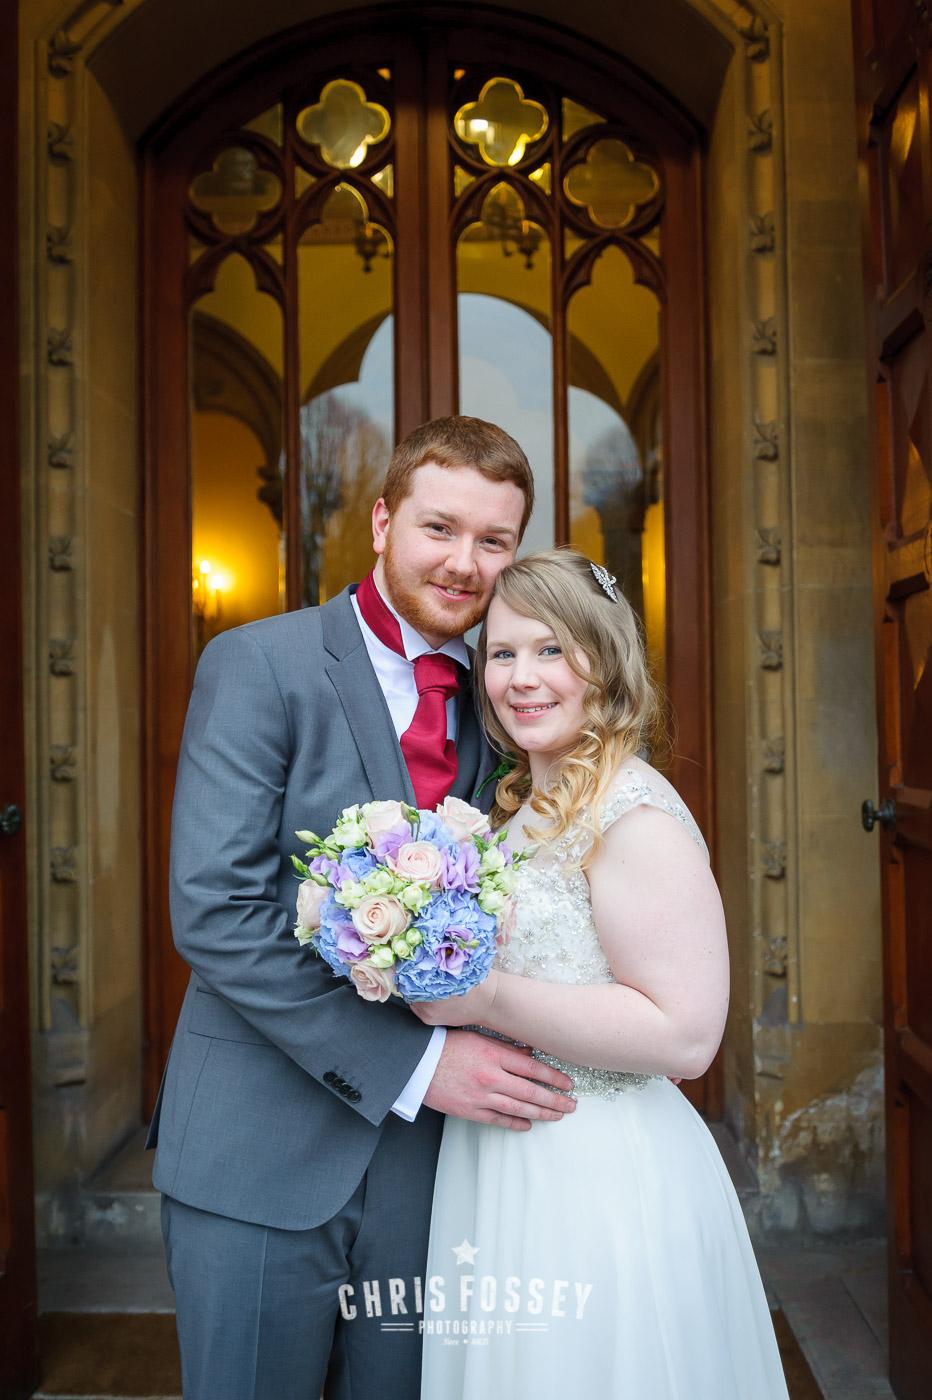 Walton Hall Stratford-upon-Avon Wedding Photography